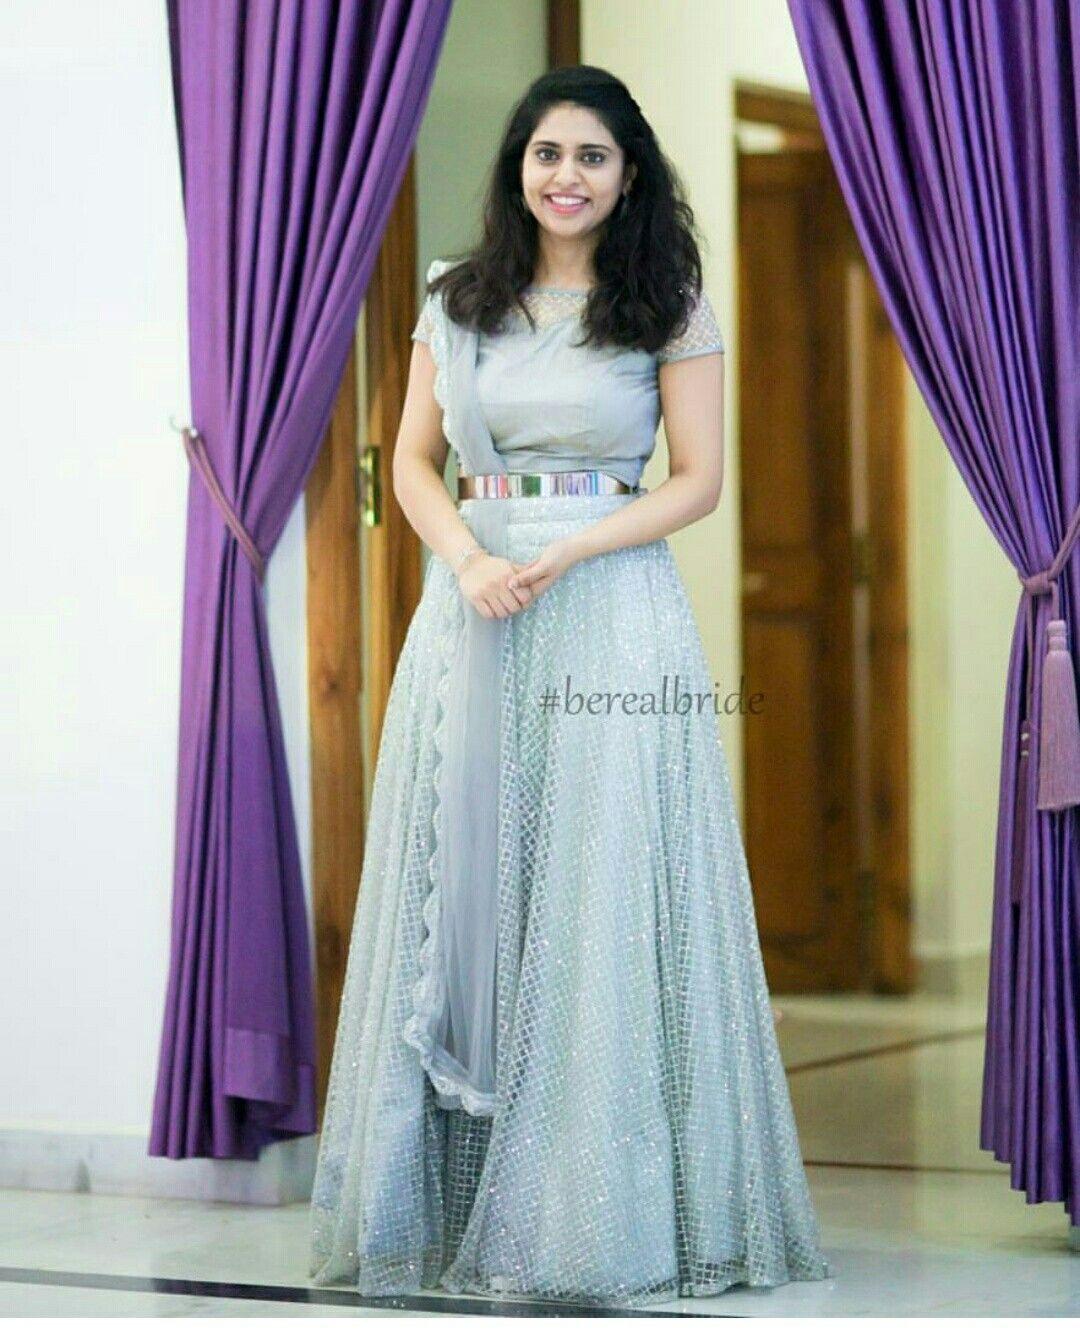 Pin by priya on work lehengas | Pinterest | Anarkali, Clothing and ...